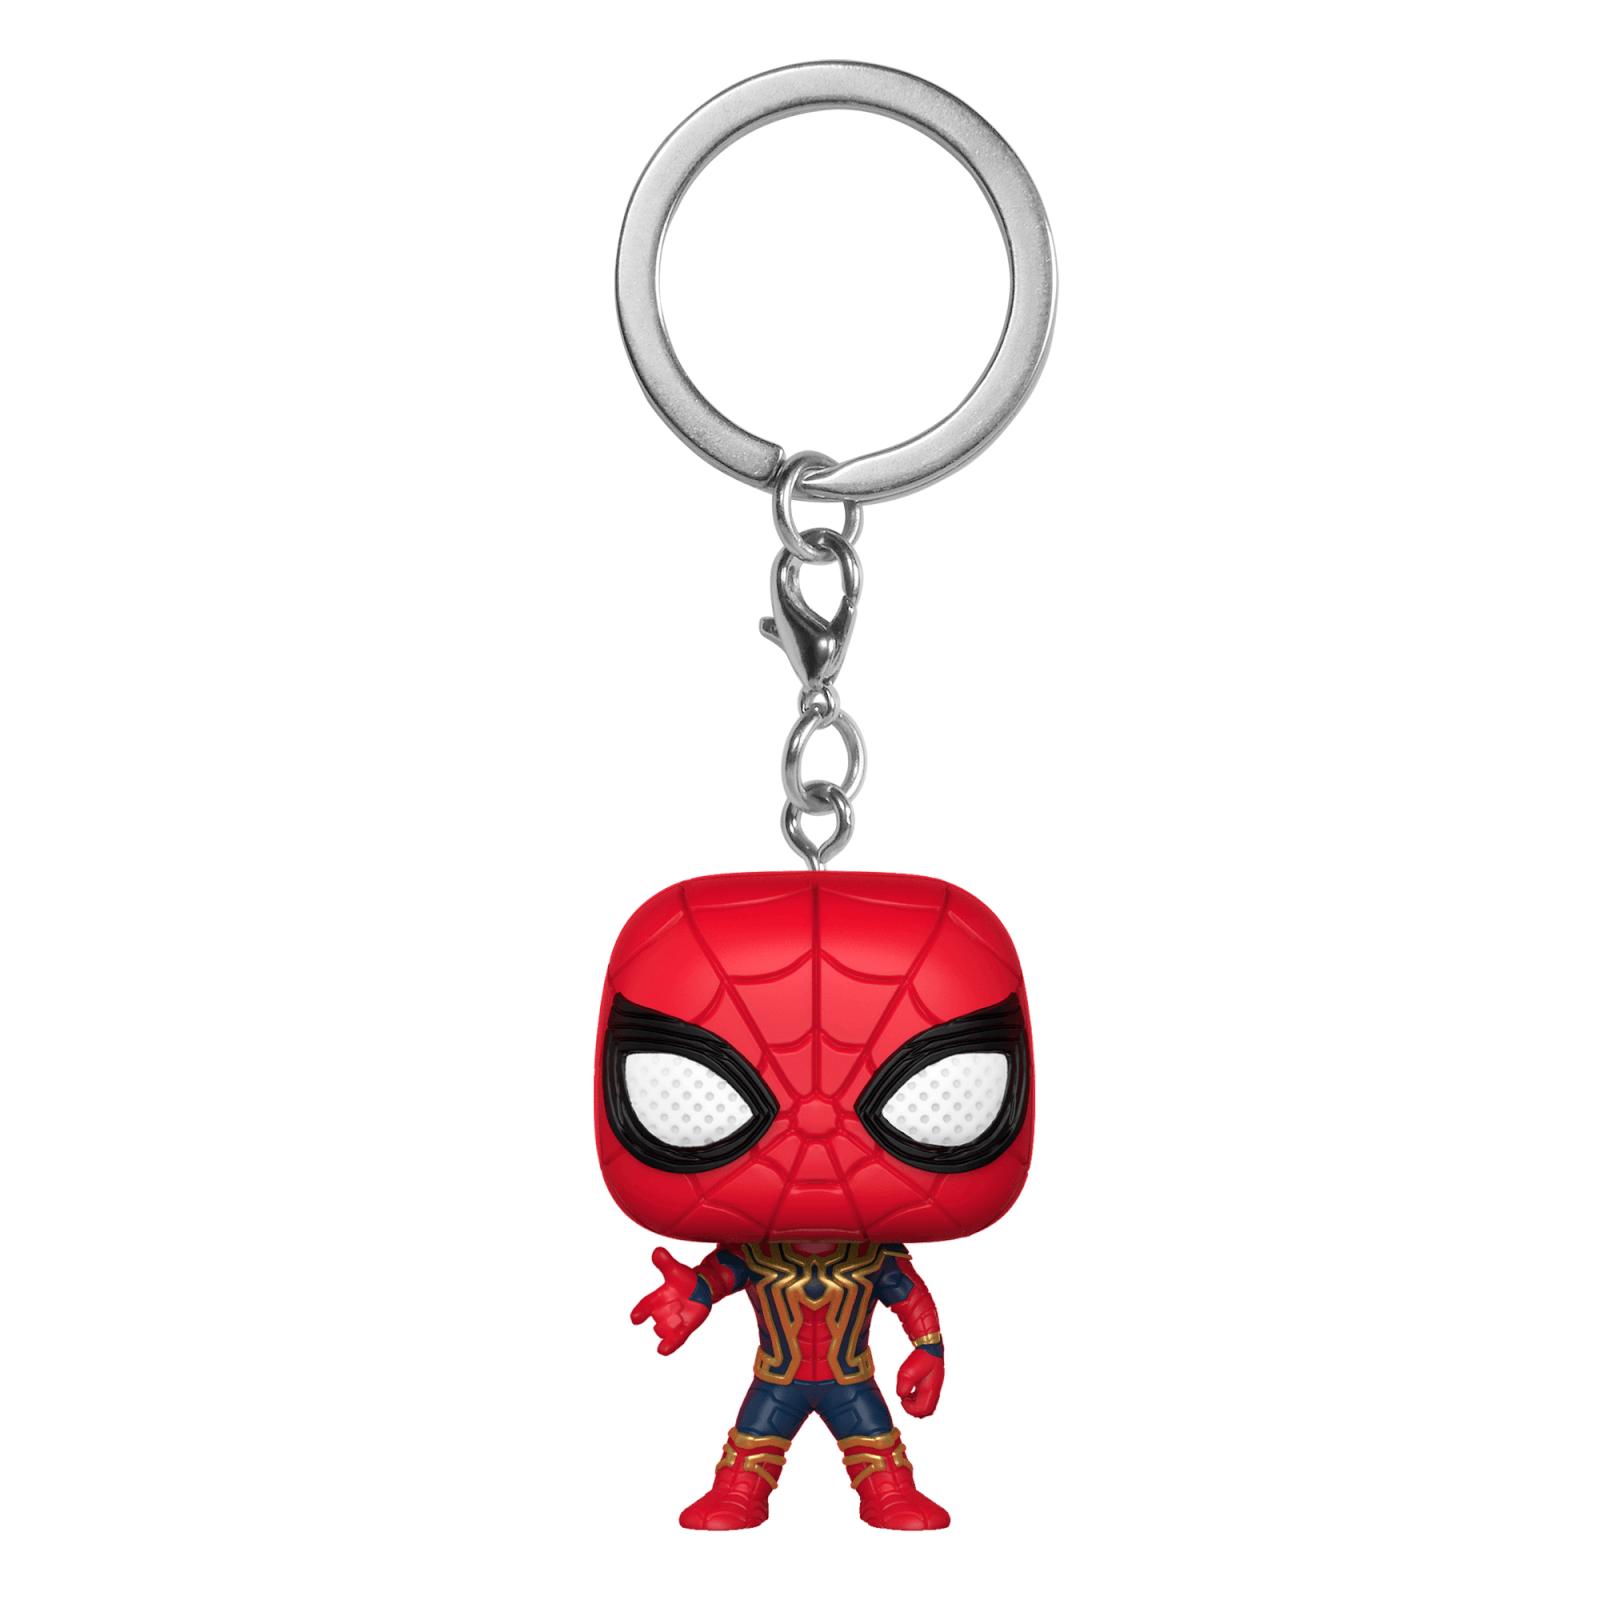 Porte Clef Pocket Pop Iron Spider Marvel Avengers